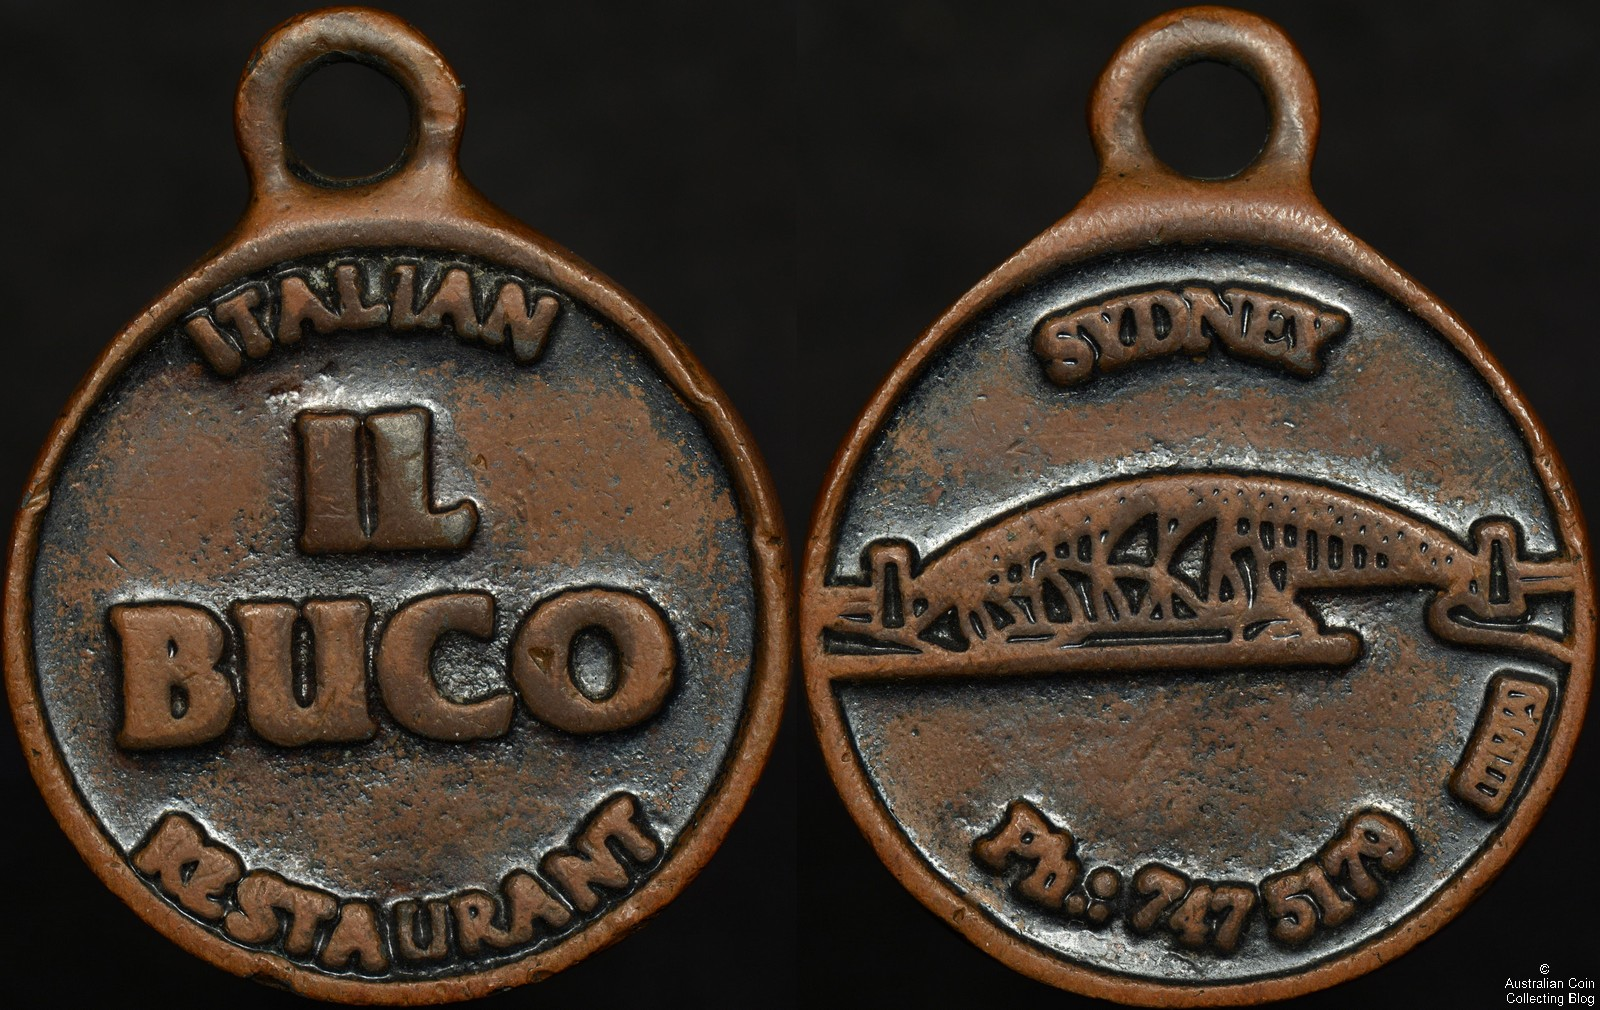 il Buco Italian Restaurant Medallion with Sydney Harbour Bridge Design